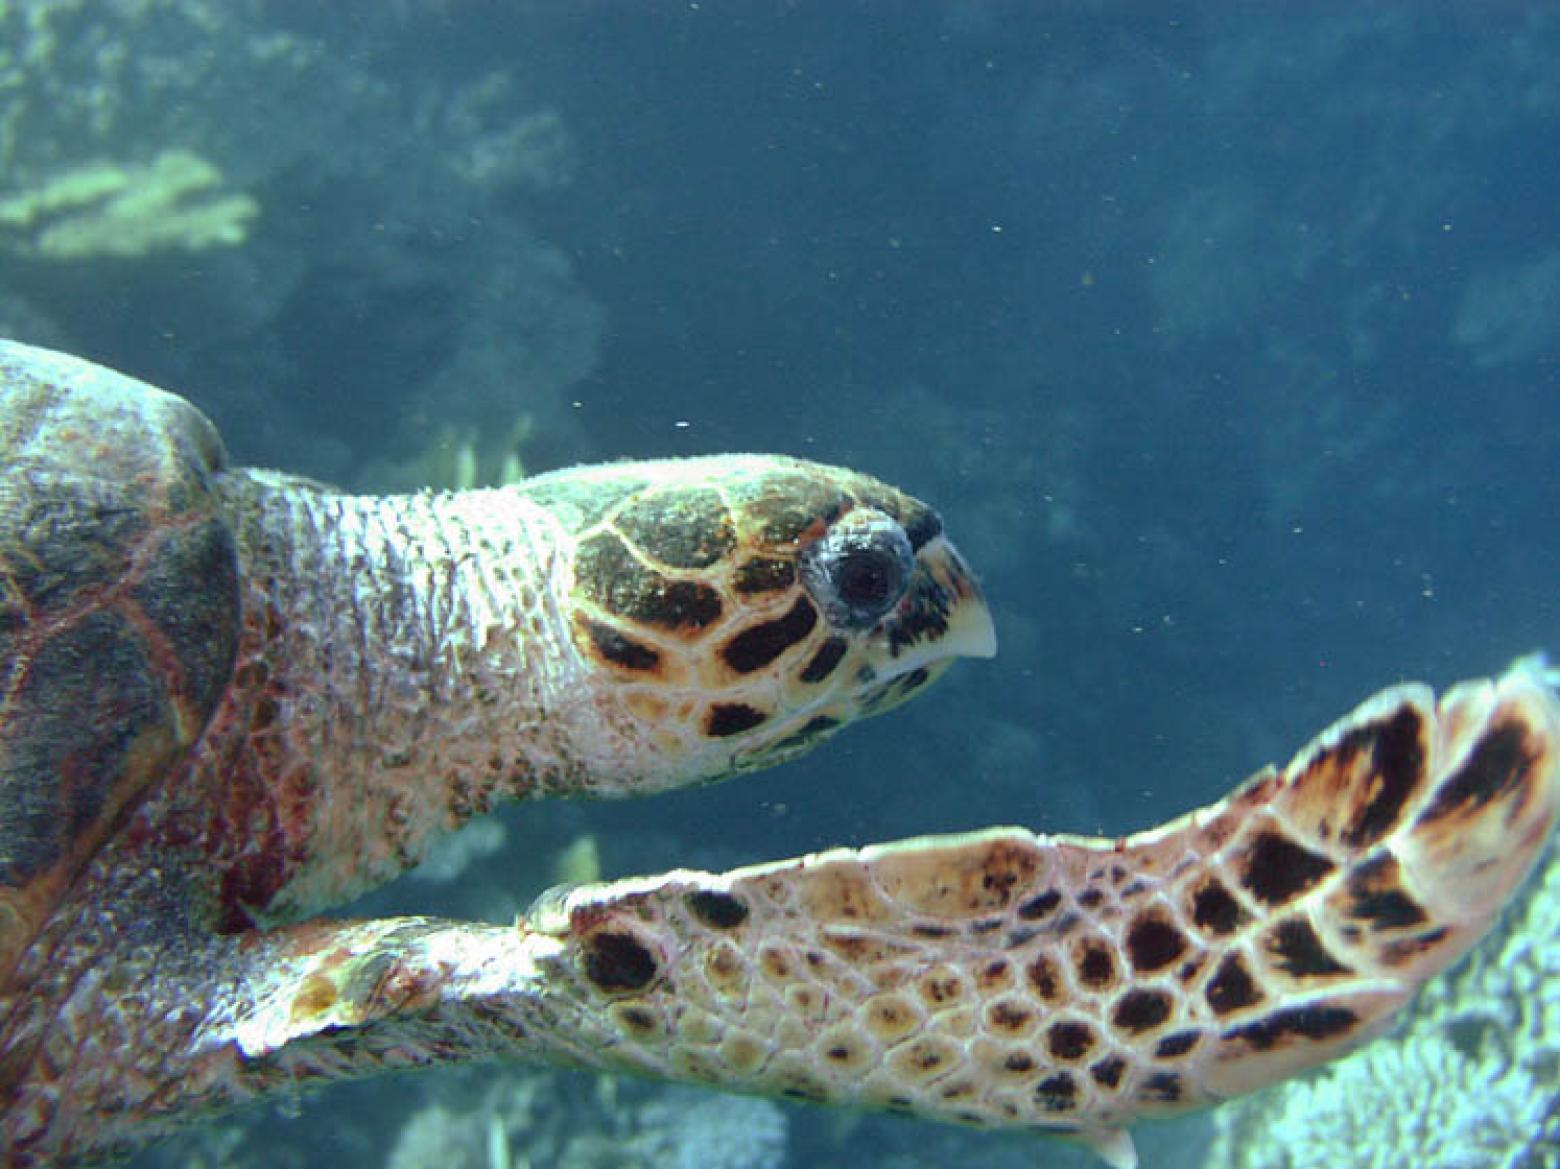 Marine turtle © IUCN Christian Laufenberg